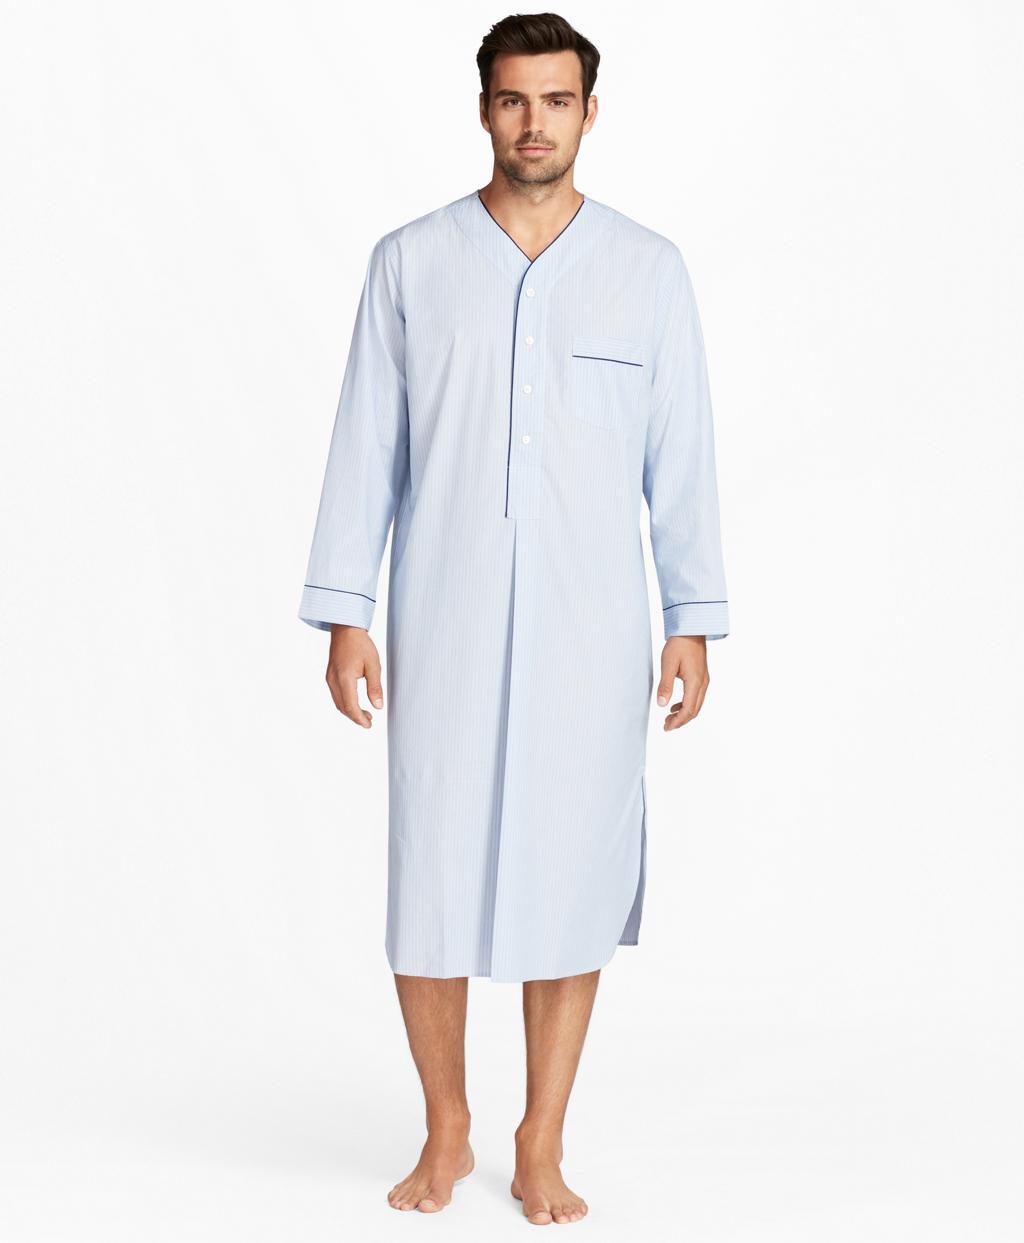 Lyst - Brooks Brothers Mini-music Stripe Nightshirt in Blue for Men b415f63ad